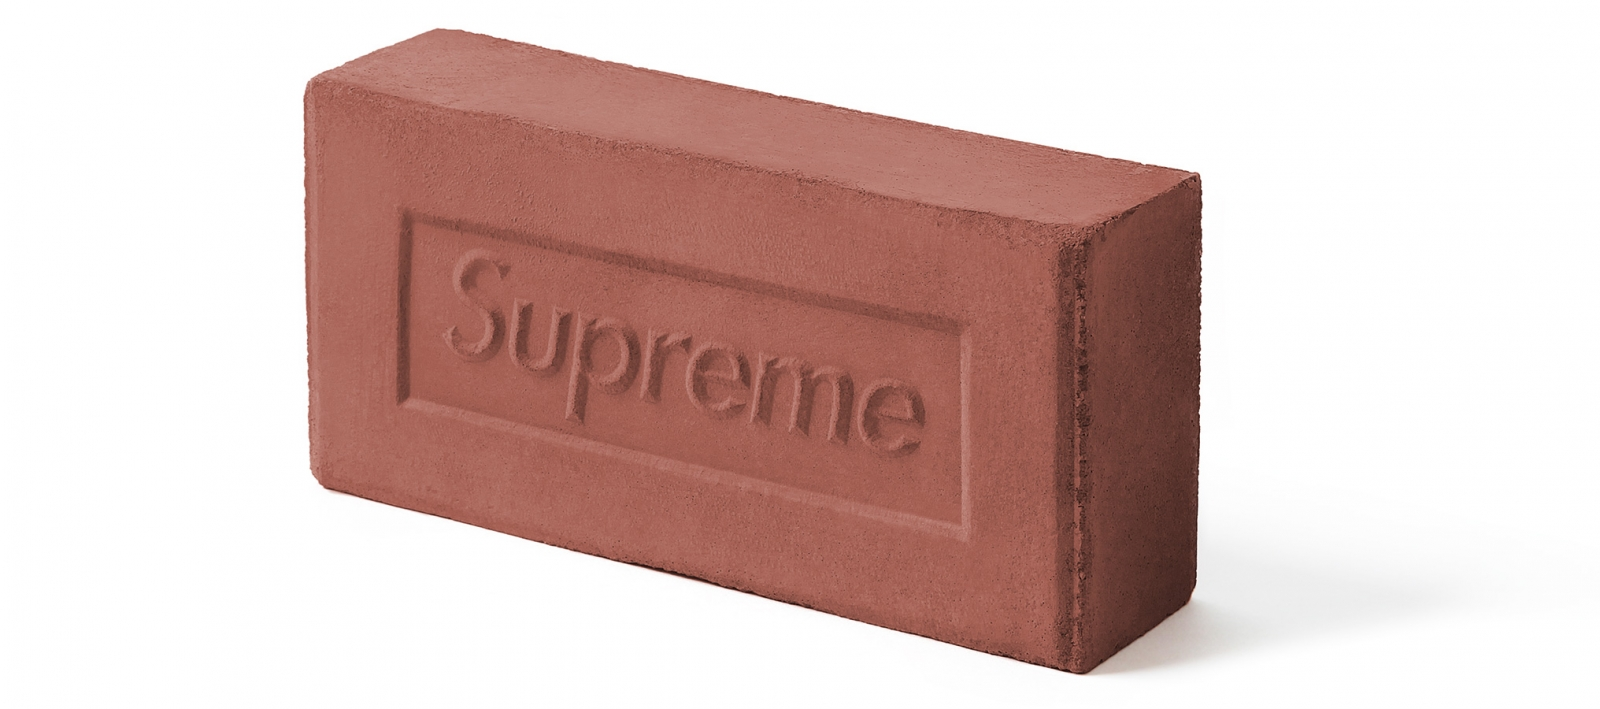 The Supreme brick